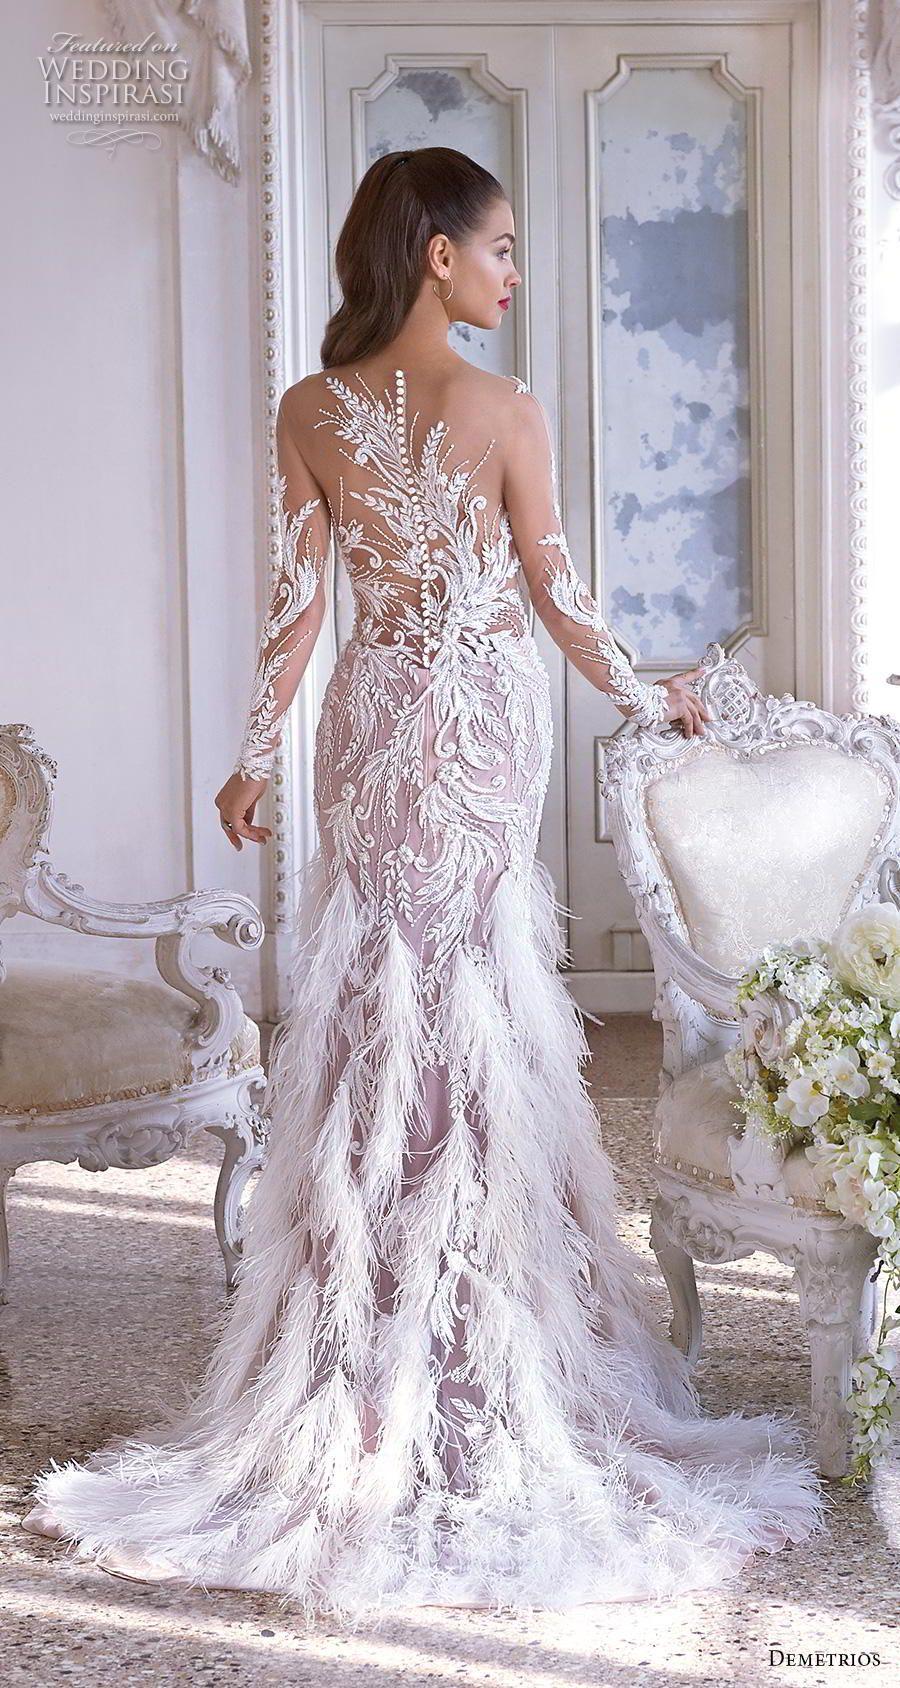 c109dee3f09 demetrios 2019 bridal long sleeves sweetheart neckline full embellishment  feathers hem drop waist a line wedding dress embellished back sweep train  (19) bv ...